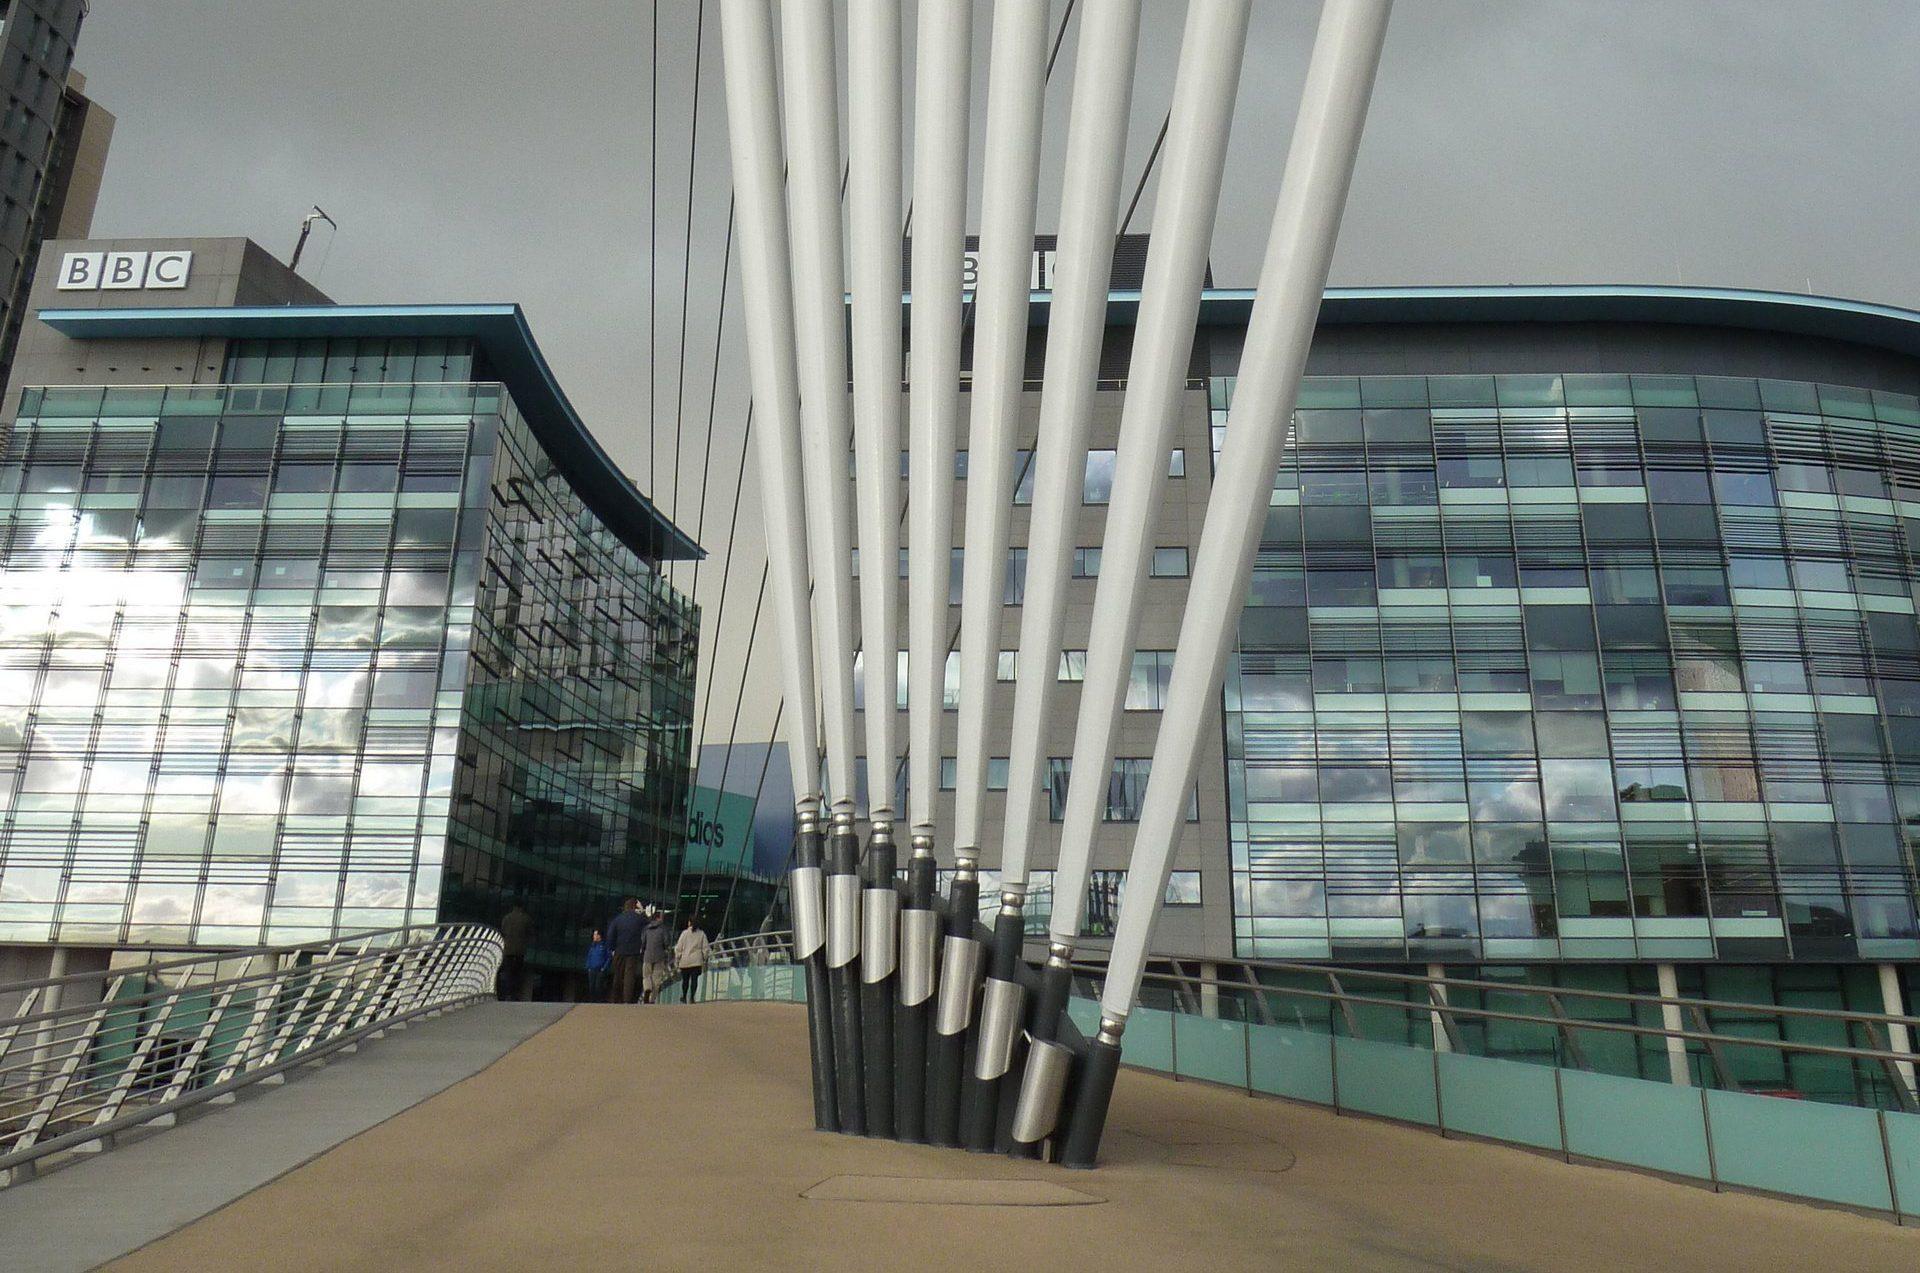 Media City Swing Bridge Bearings at base of masts